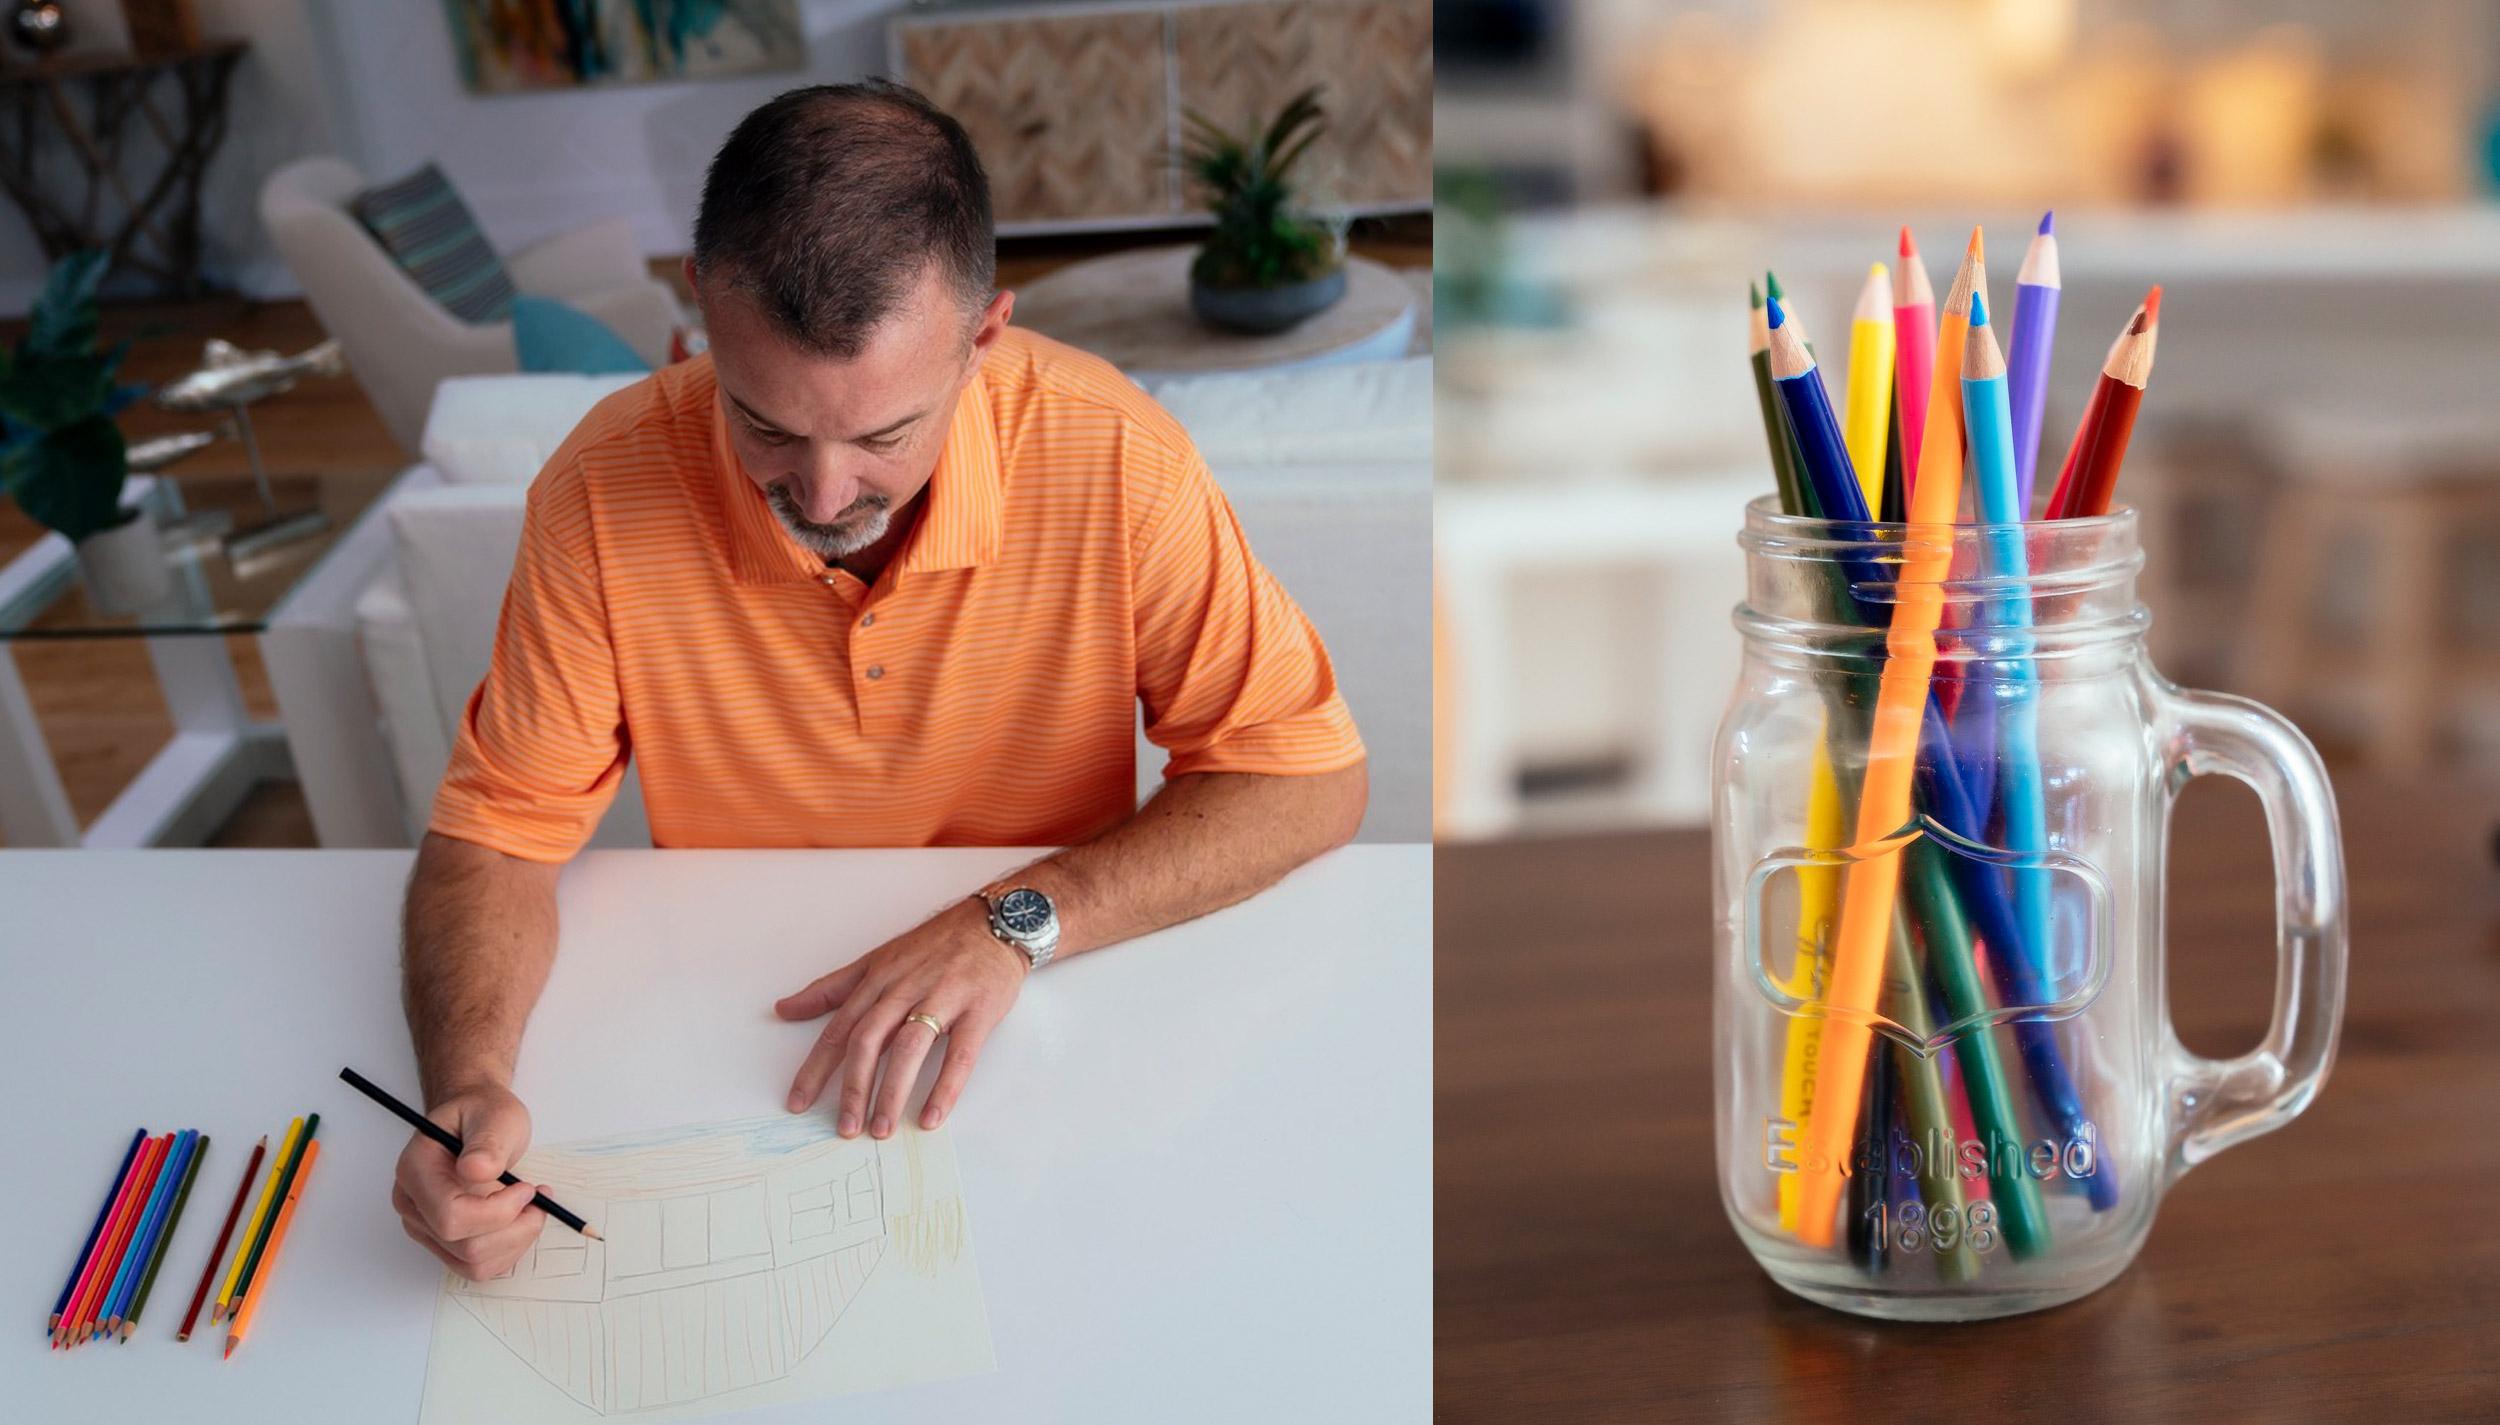 bf_drawn_home_shawn_and_pencils_photos.jpg